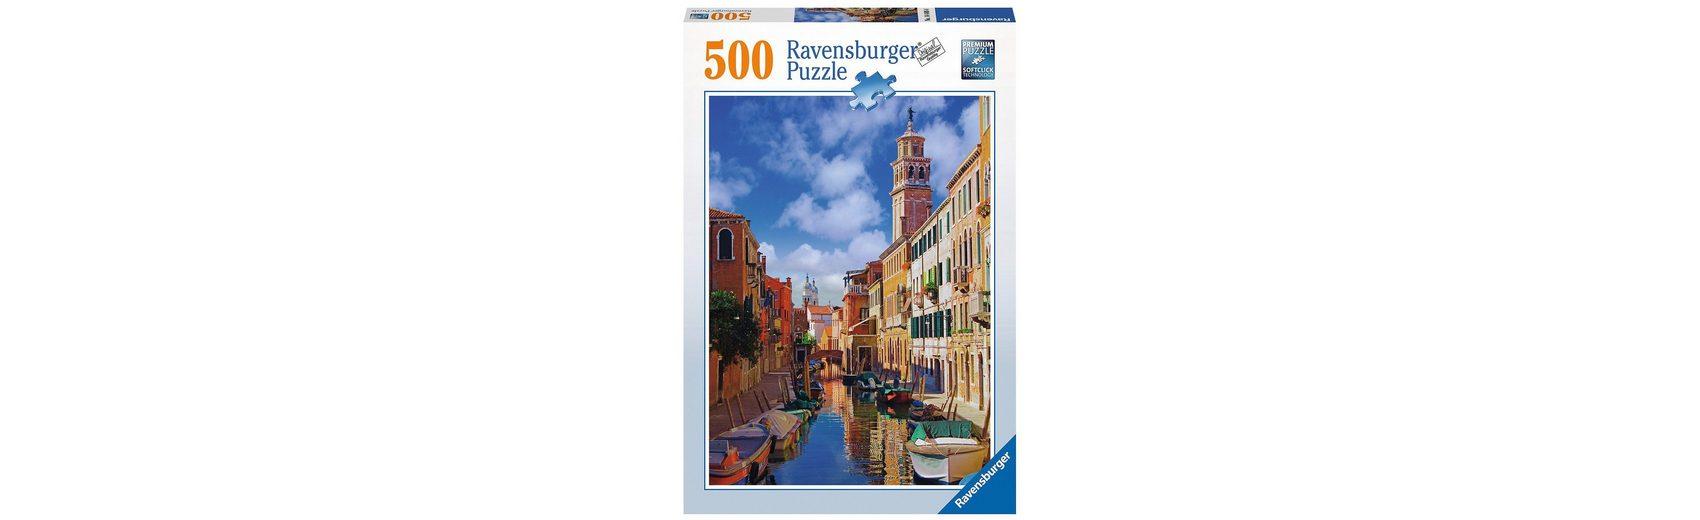 Ravensburger In Venedig 500 Teile